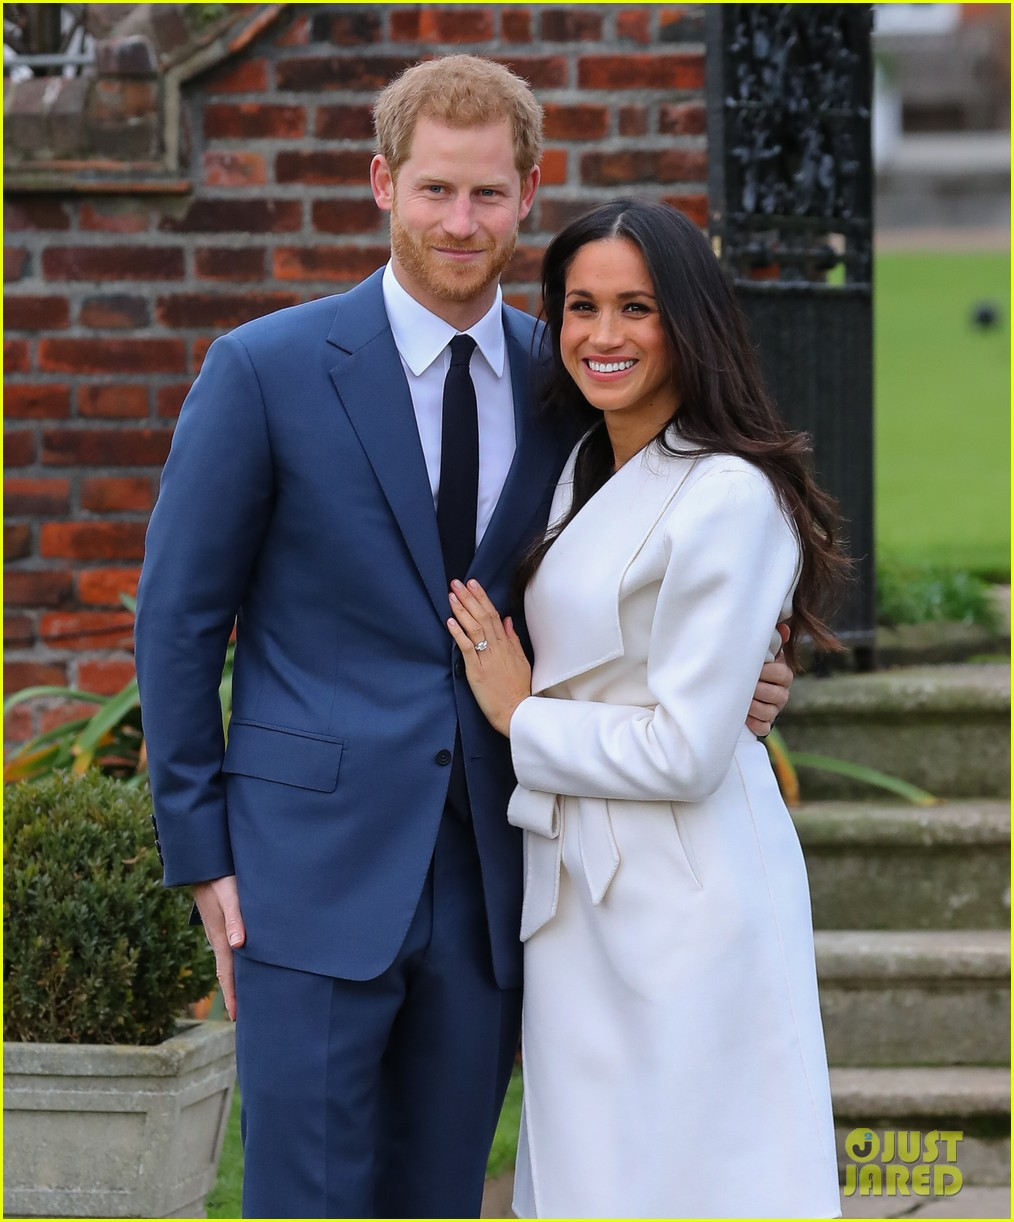 Meghan Markle & Prince Harry Talk About Having Kids One